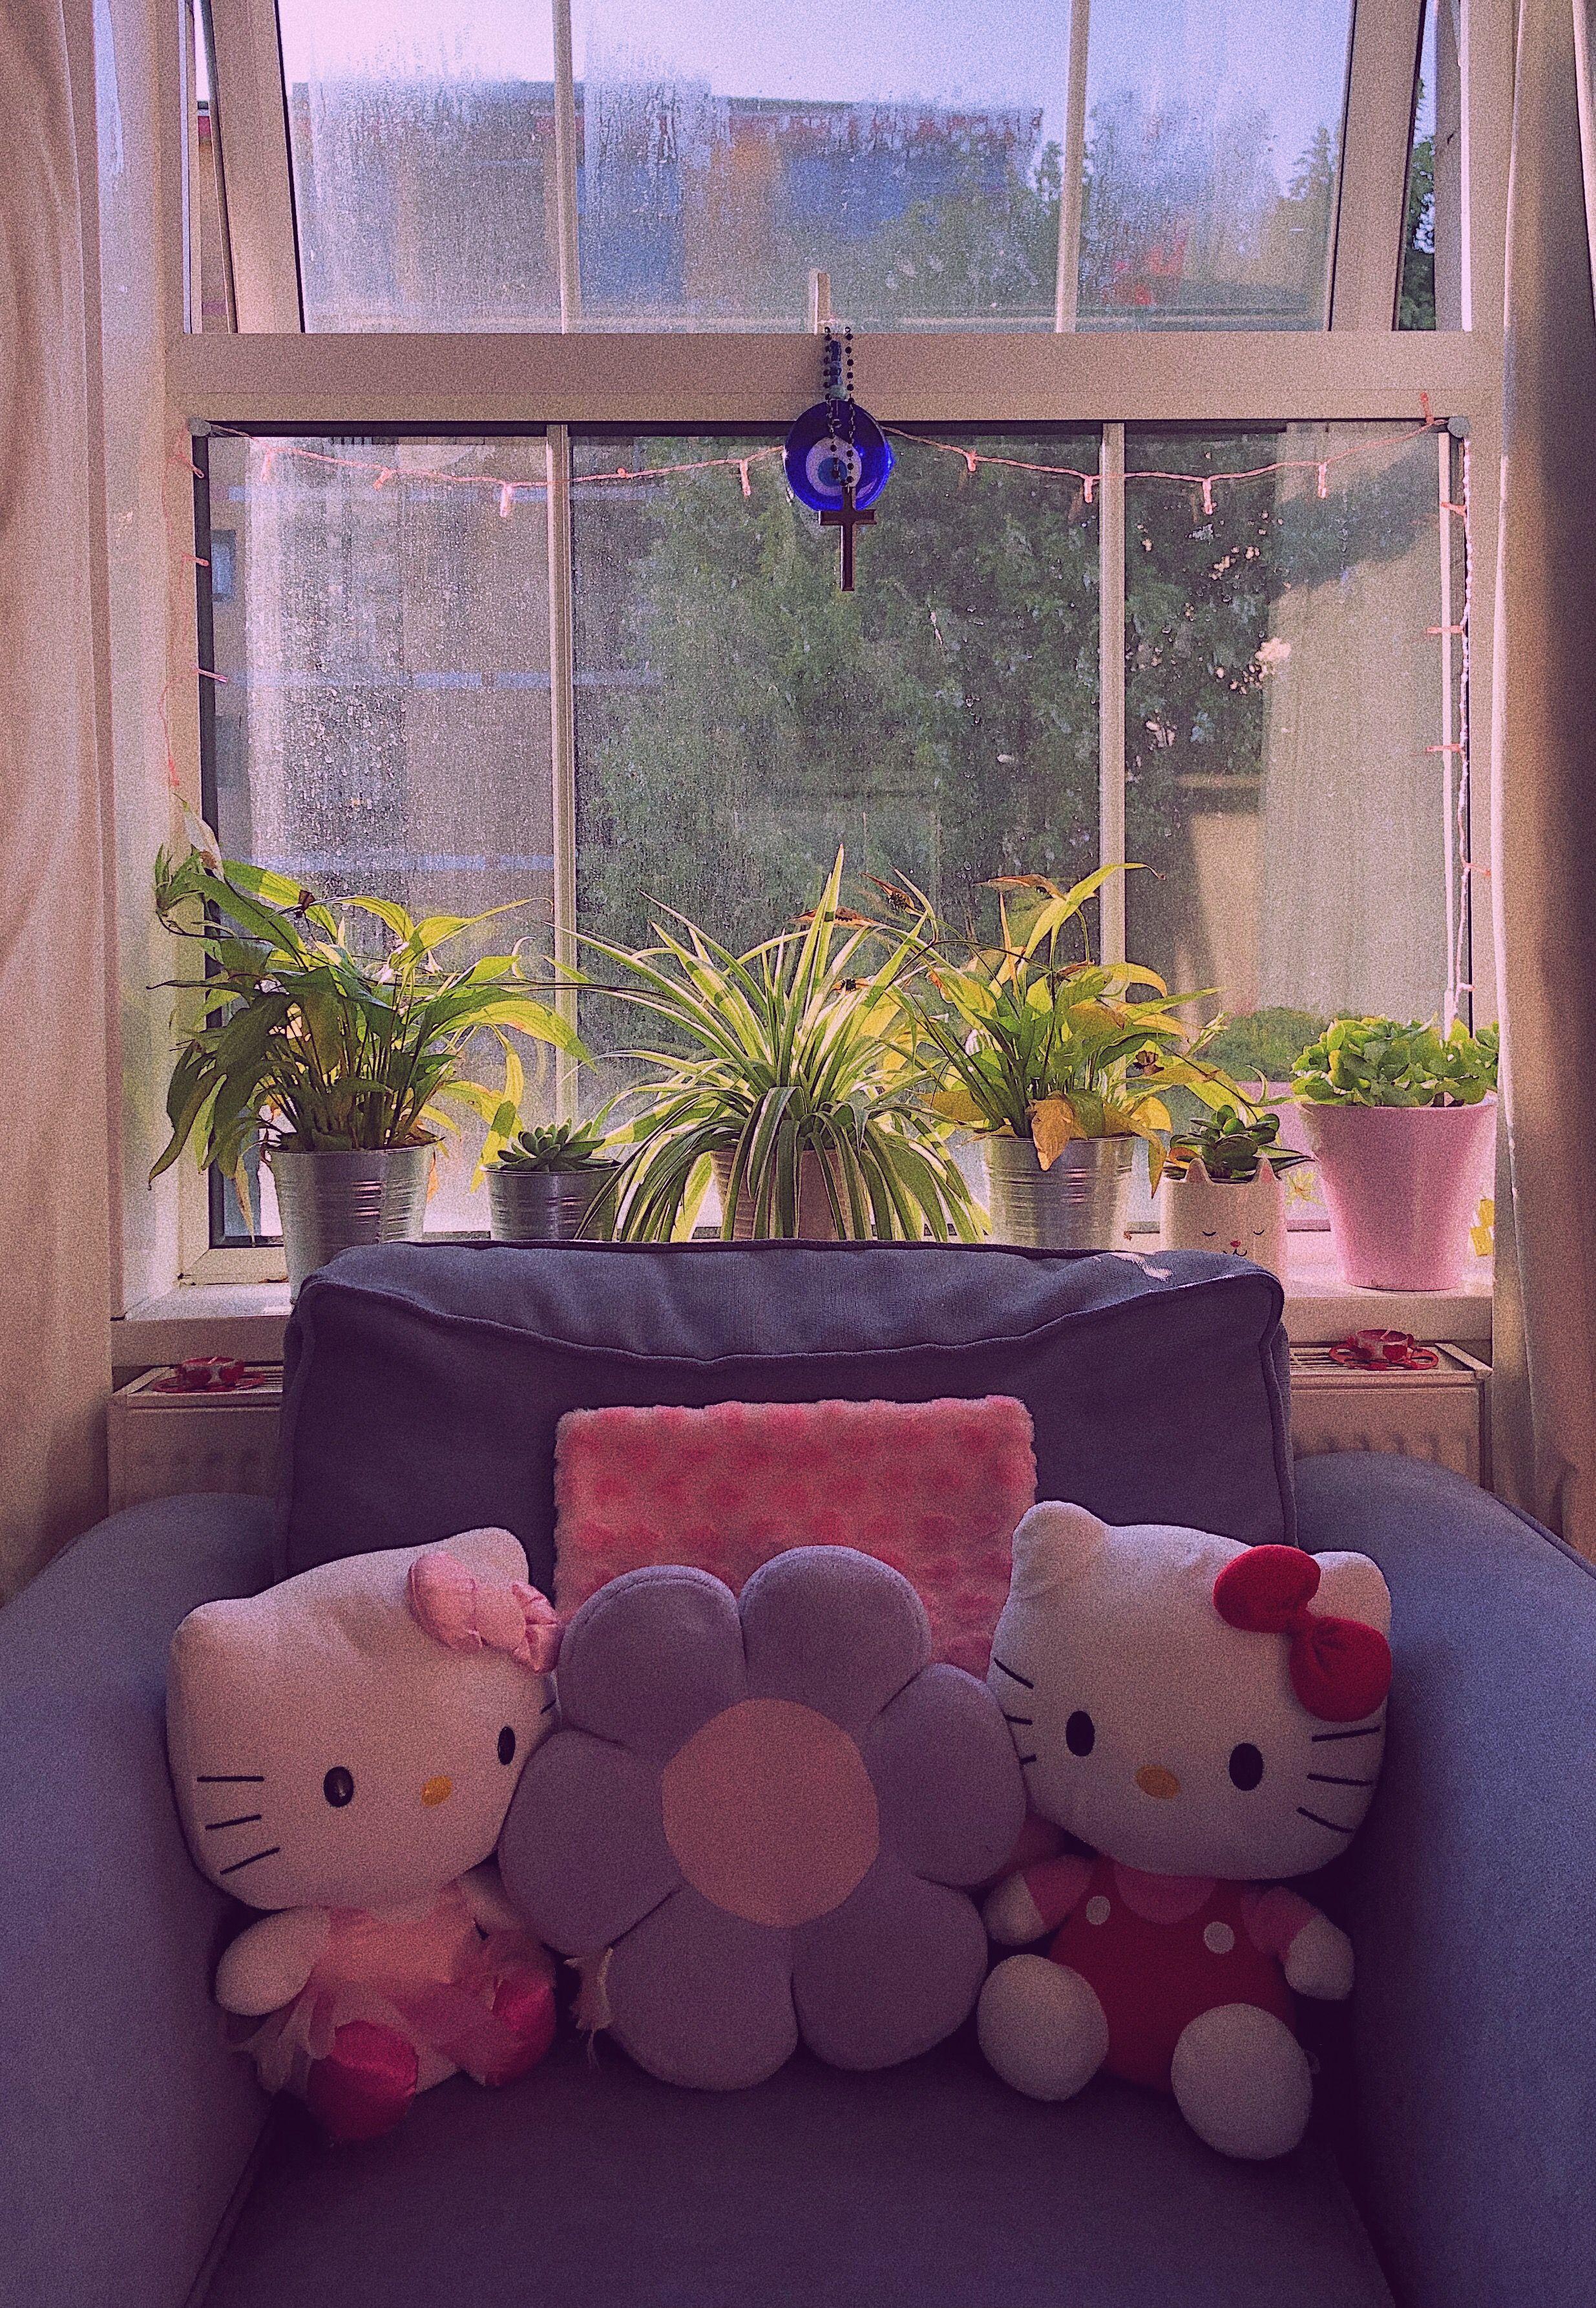 Fresh plants hello kitty Y2k room window in 2020 | Hello ...